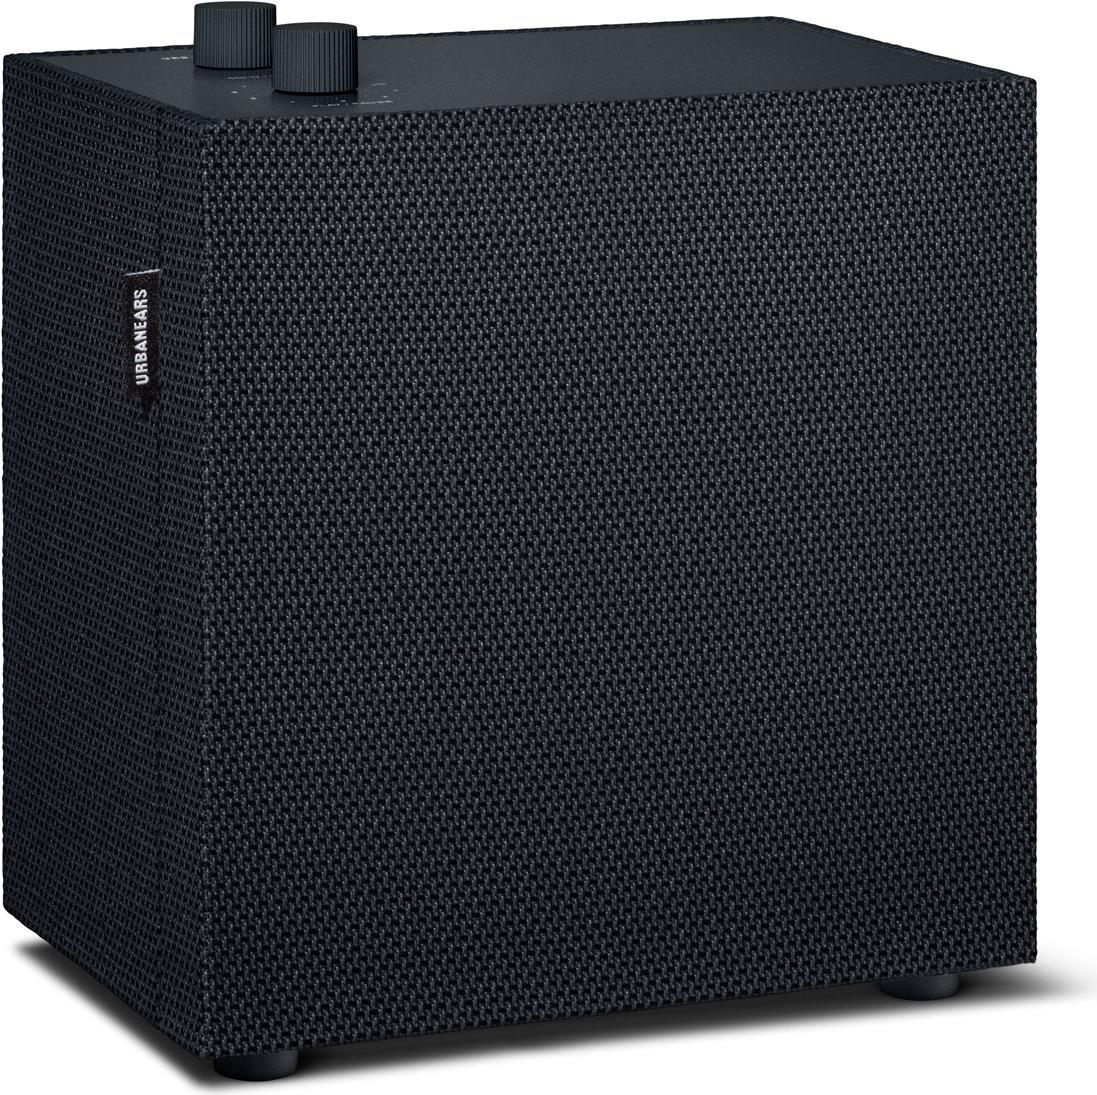 Lautsprecher - Urbanears Lotsen Vinyl Black Multiroom Lautsprecher (WiFi, Bluetooth 4.2, AirPlay, Spotify Connect, 3.5mm Input) (04092148)  - Onlineshop JACOB Elektronik